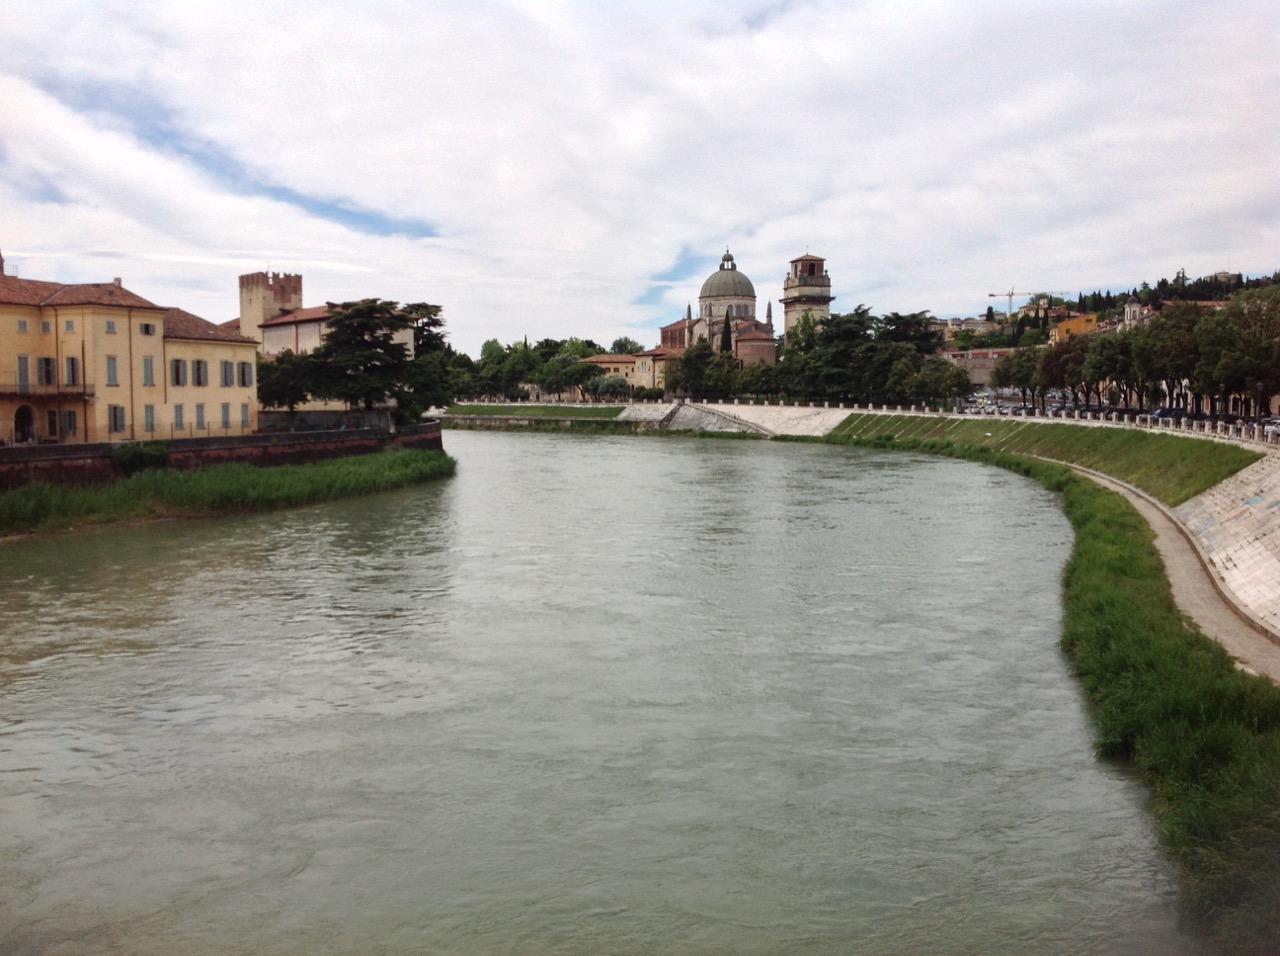 The grand river Adige